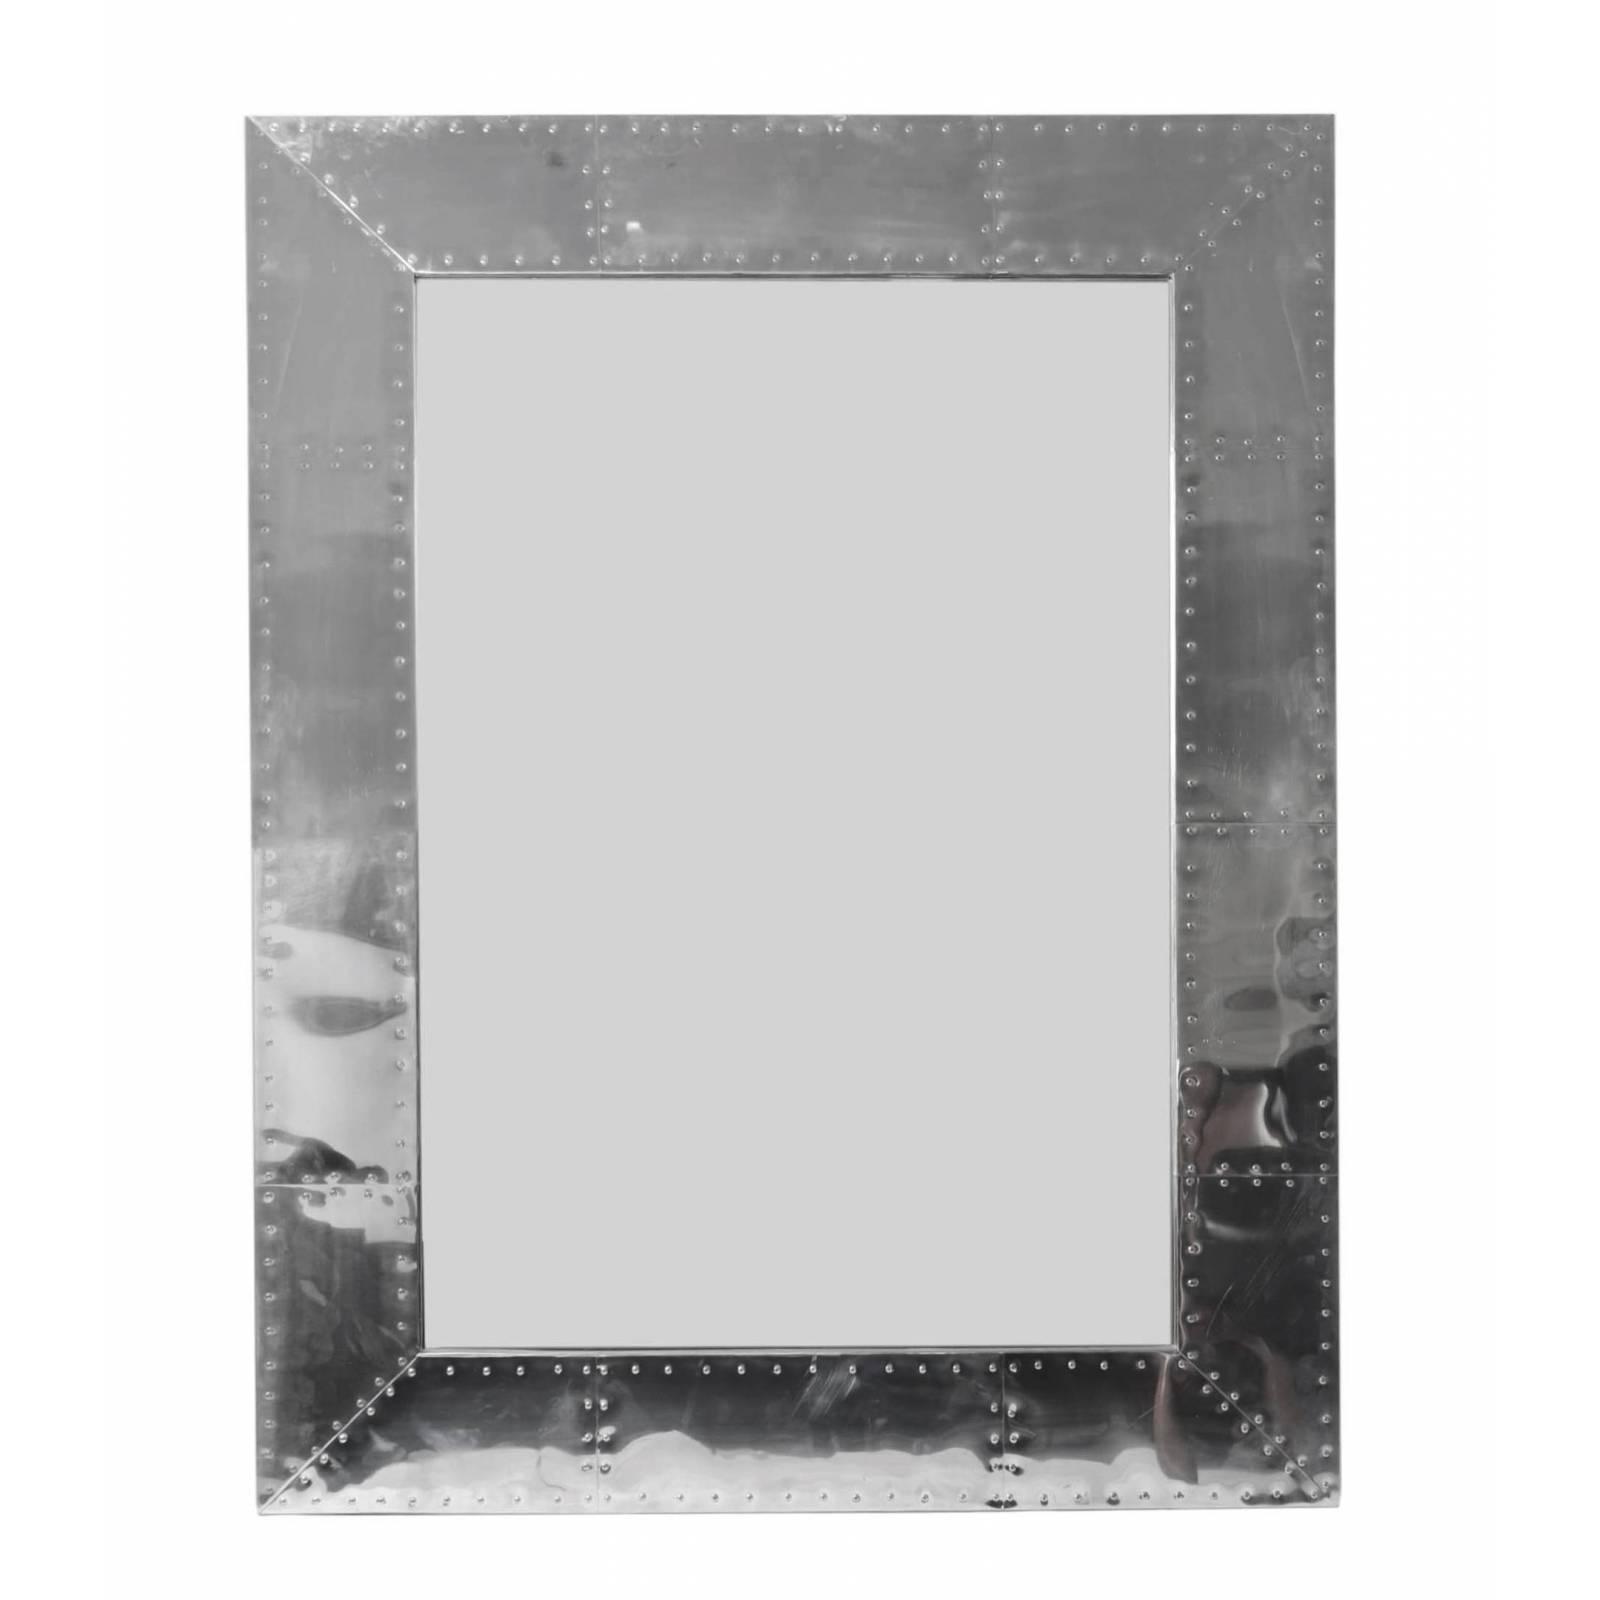 Mirroir DC3 rectangulaire plat Miroirs muraux - 1